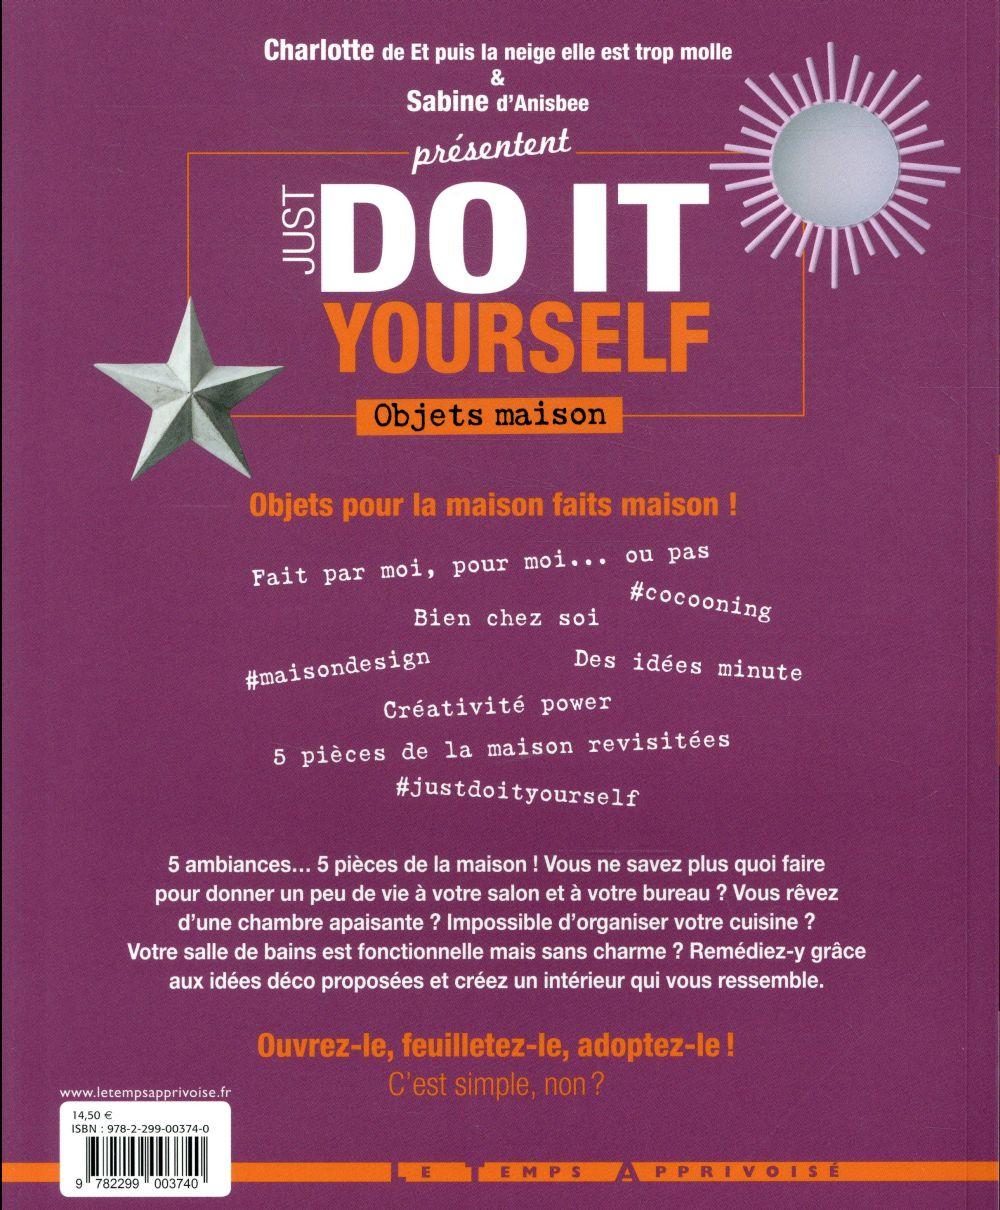 Just do it yourself ; objets maison